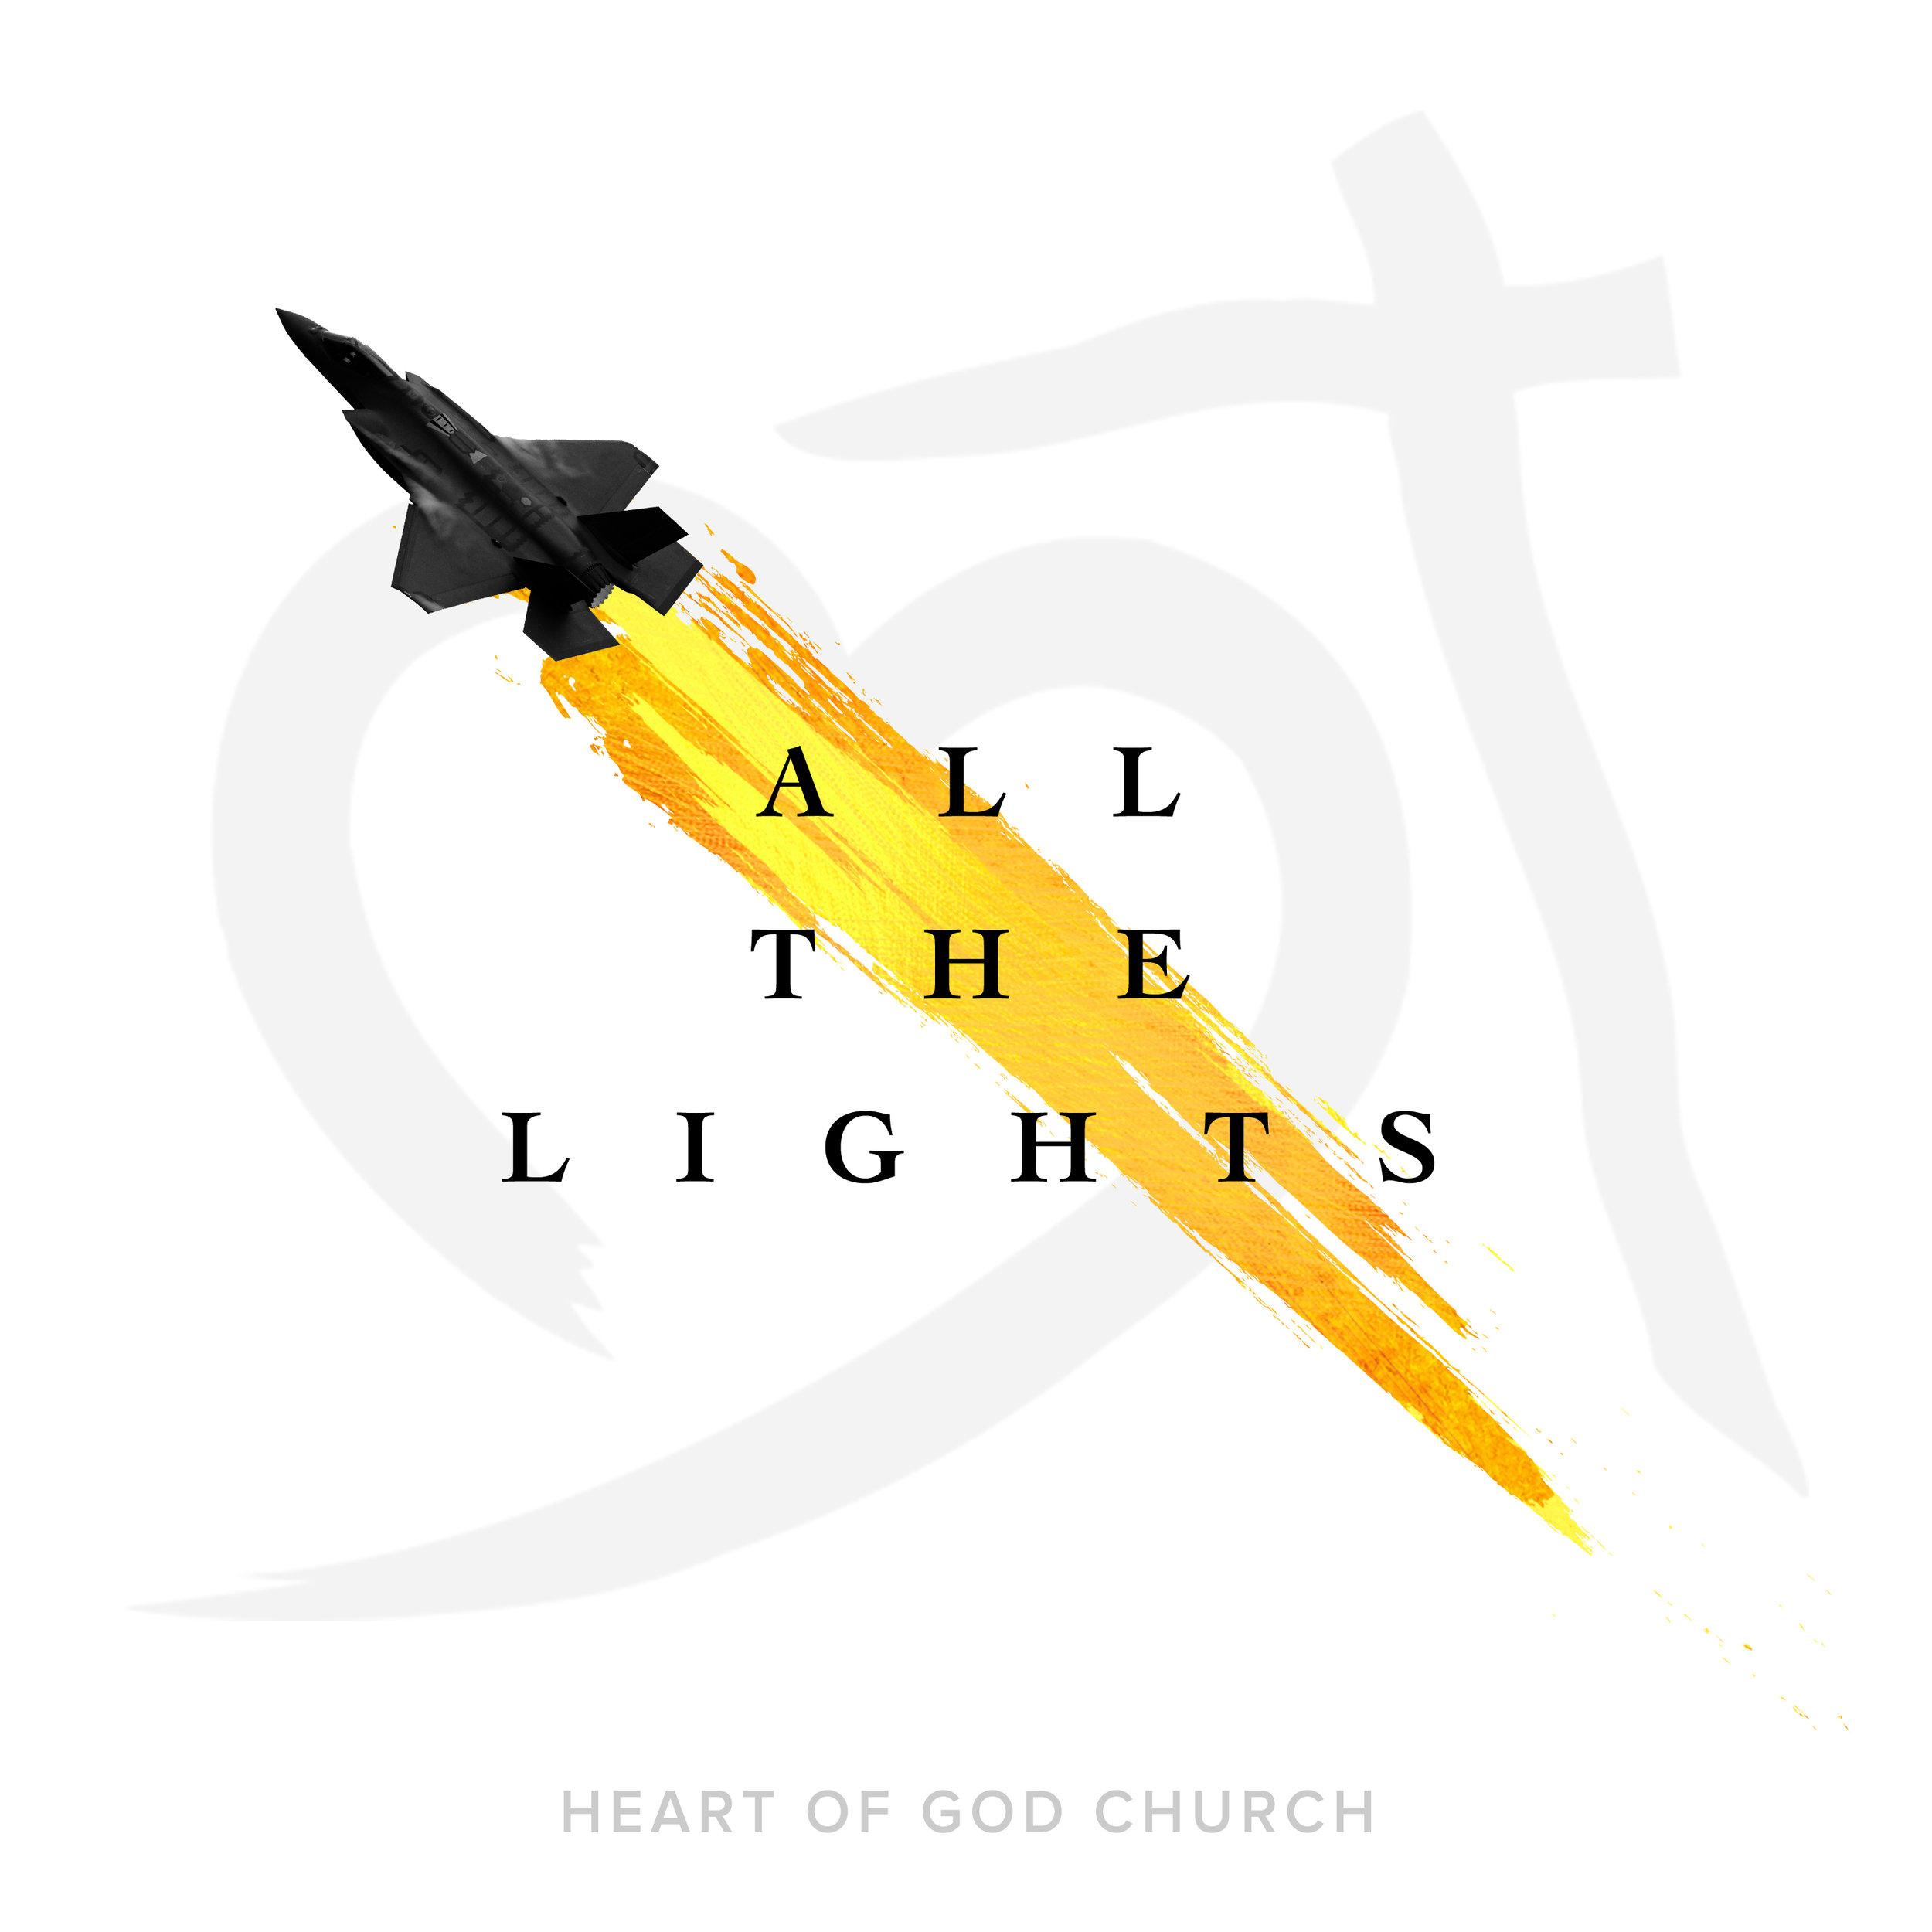 Heart of God Church_ All The Lights Single_3000x3000_web2.jpg